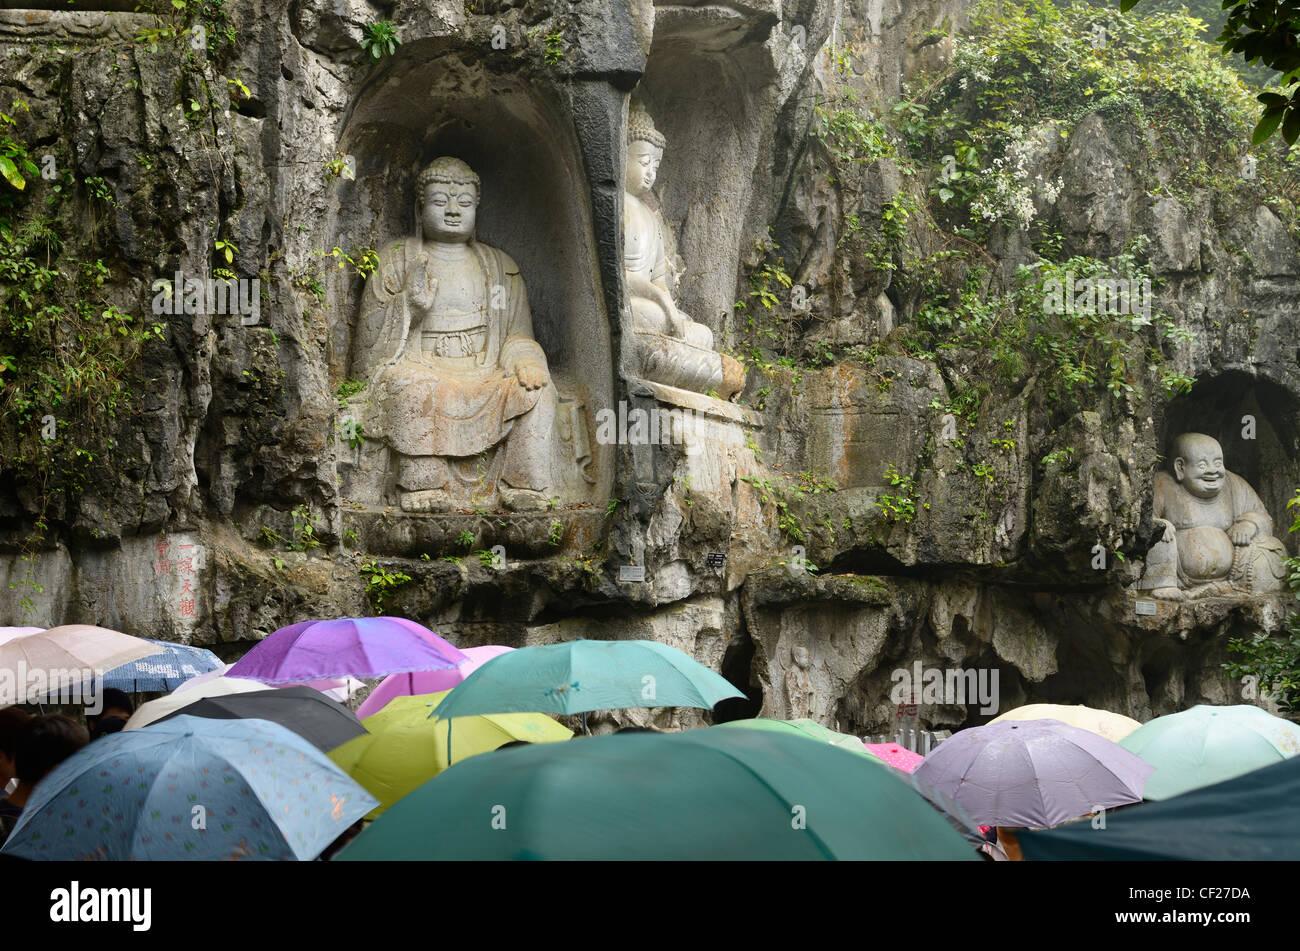 Kalkstein Buddha Skulpturen in feilai Feng im Regen mit Sonnenschirmen ling Yin Tempel Hangzhou China Stockbild